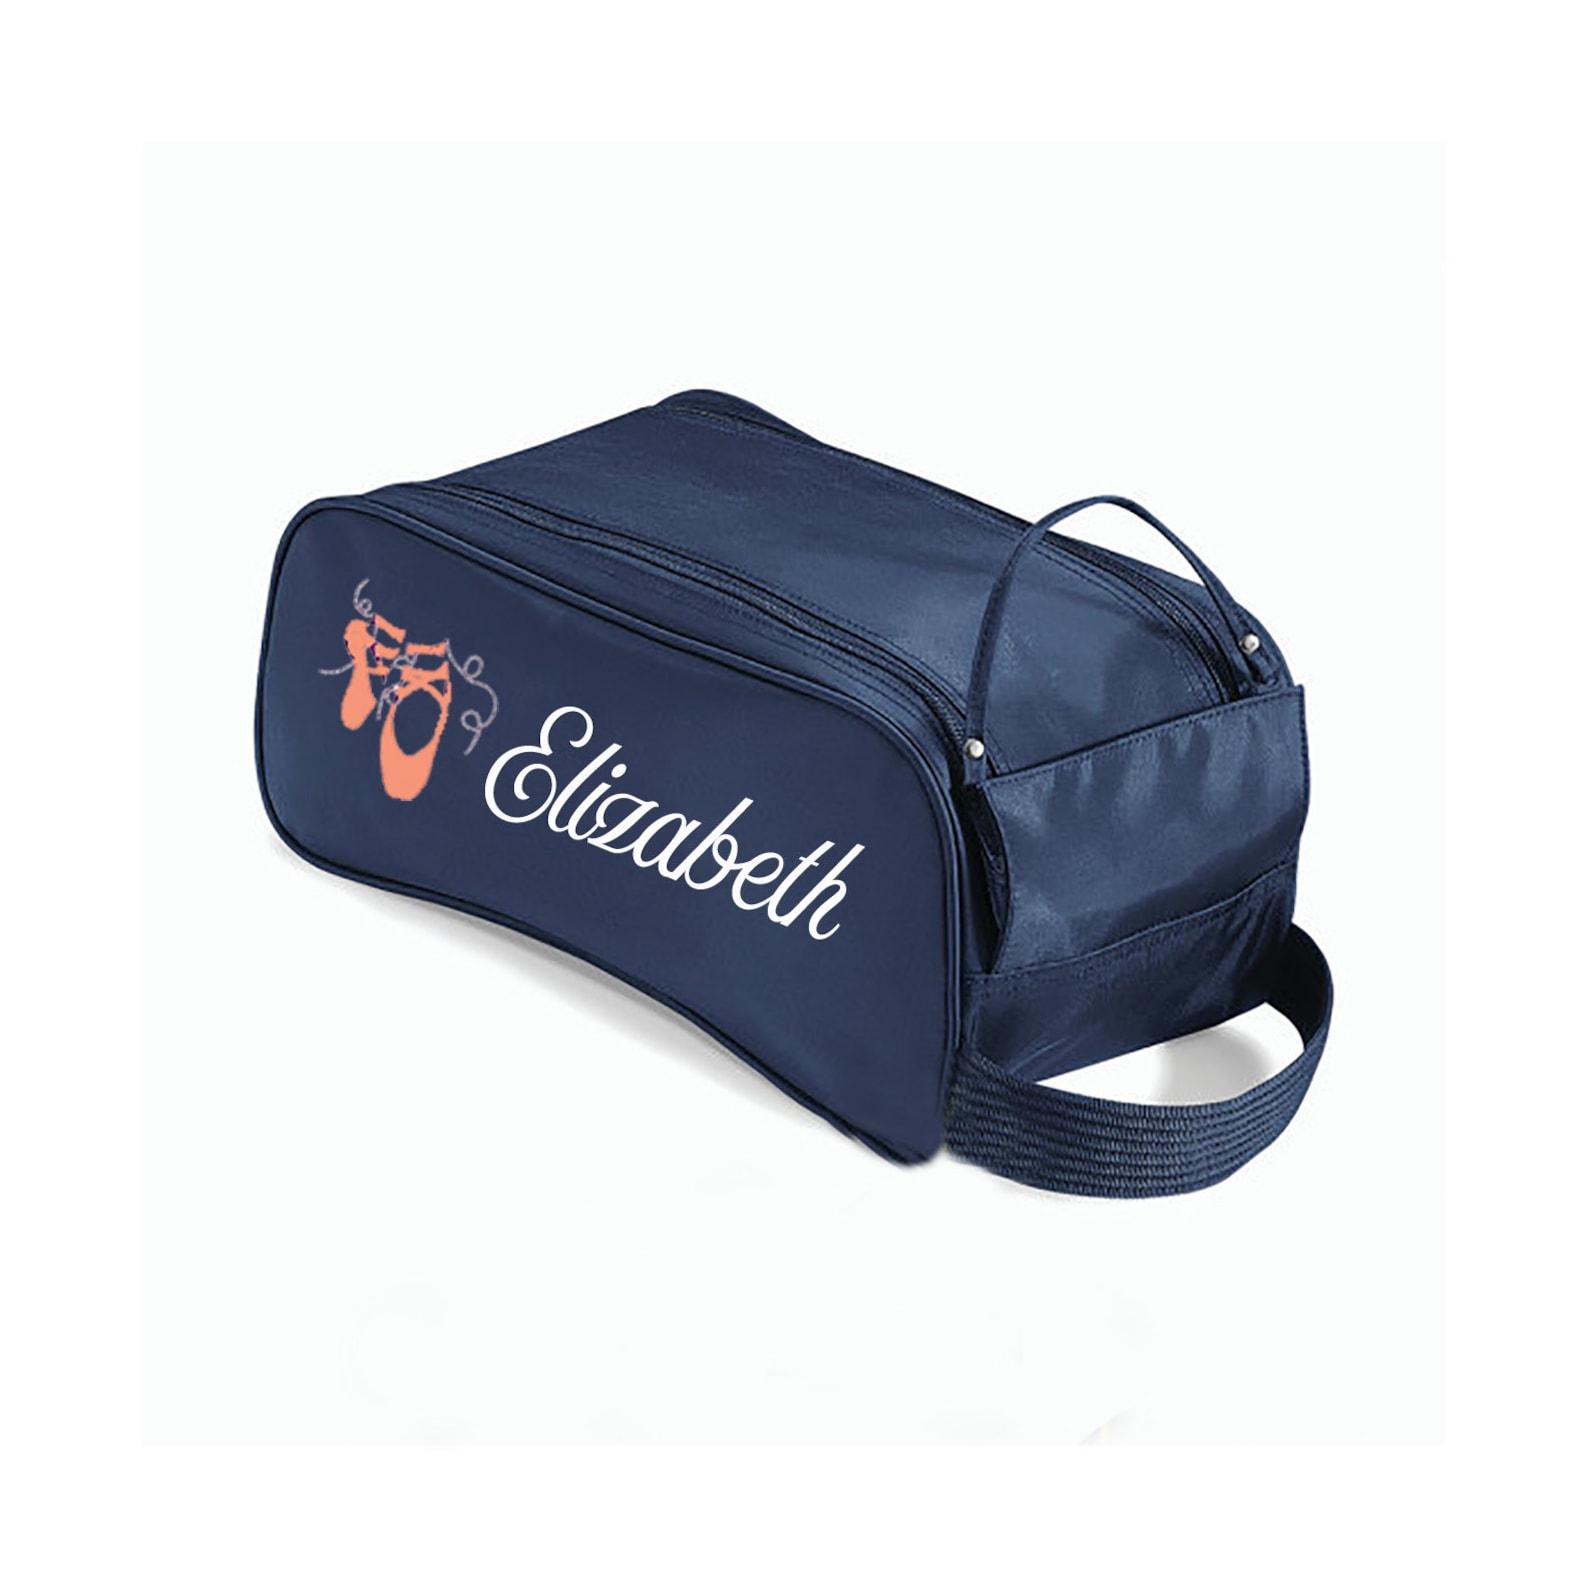 ballet shoe bag, dance bag, ballet bag, pointe shoe bag, dance shoes, personalized bag, dance teacher gift, dance recital gift,